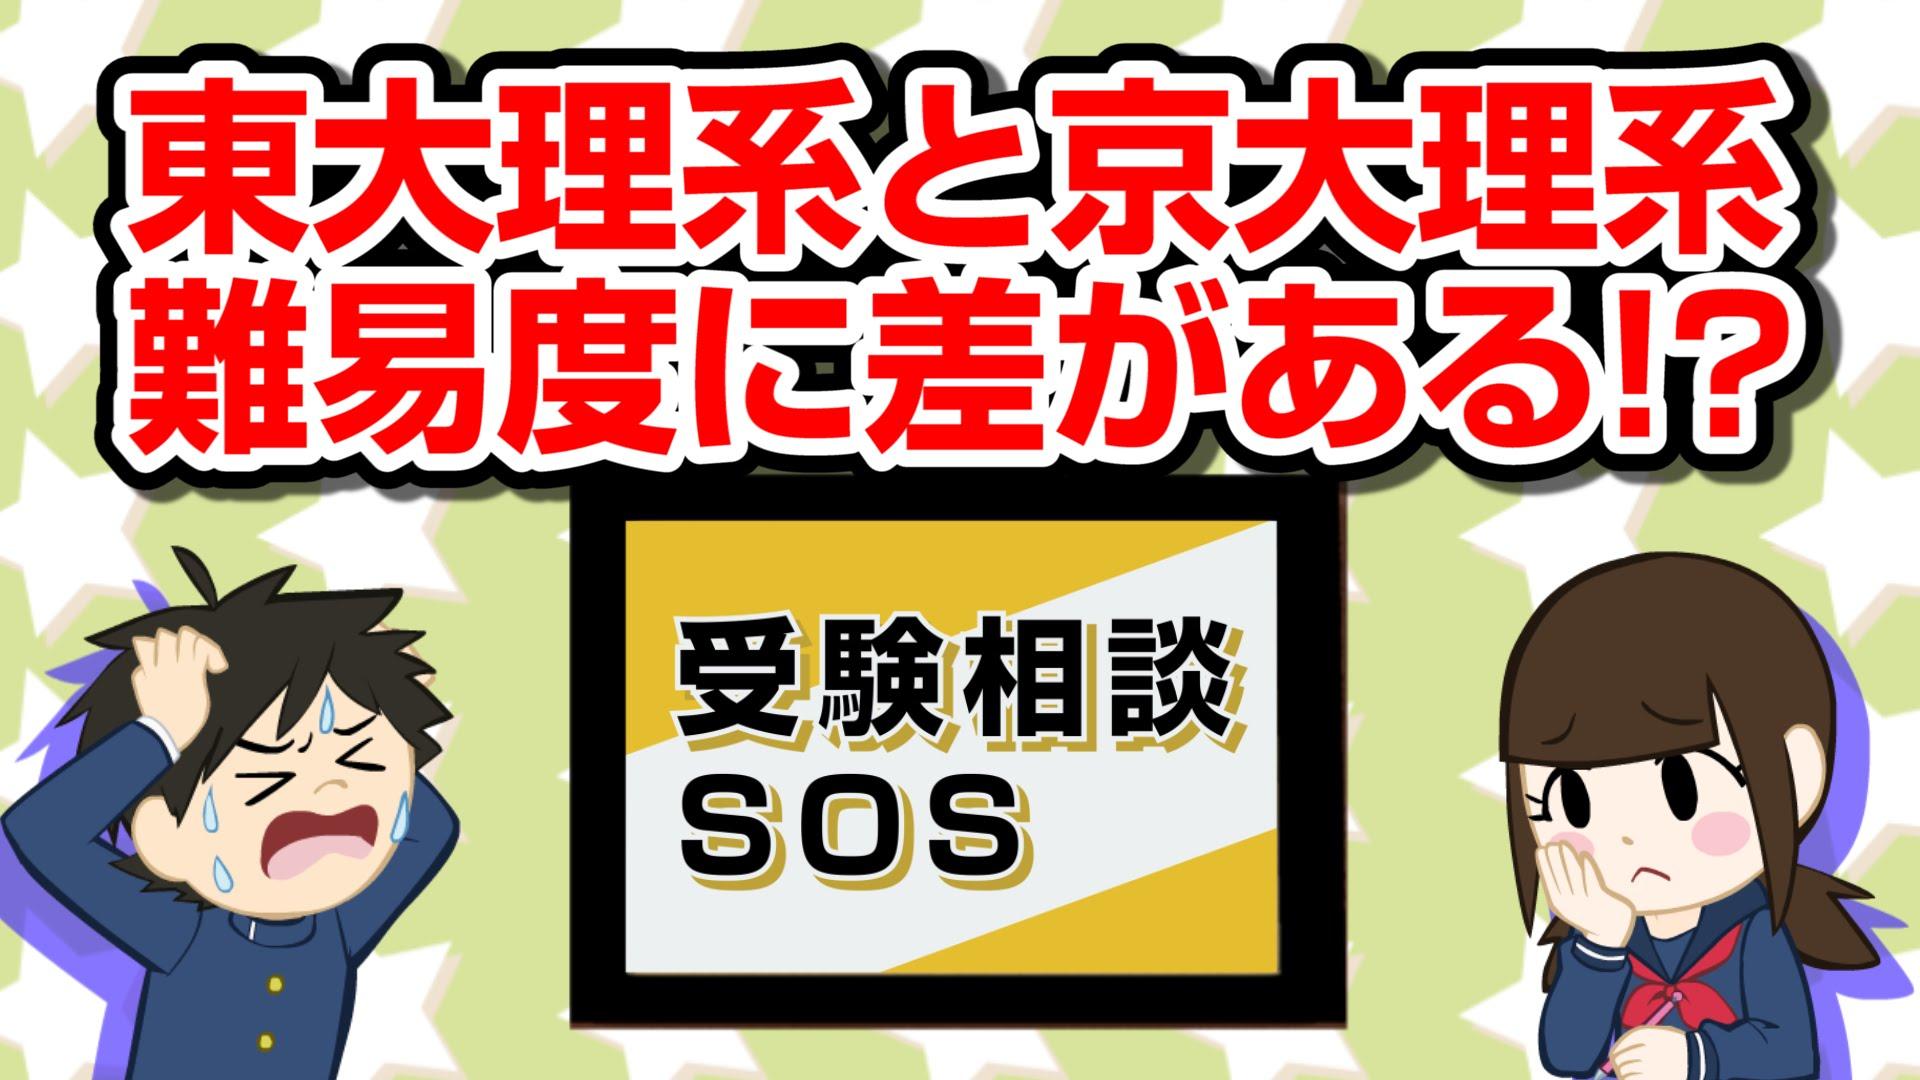 【vol.96】東大理系と京大理系の難易度!? 受験相談SOS